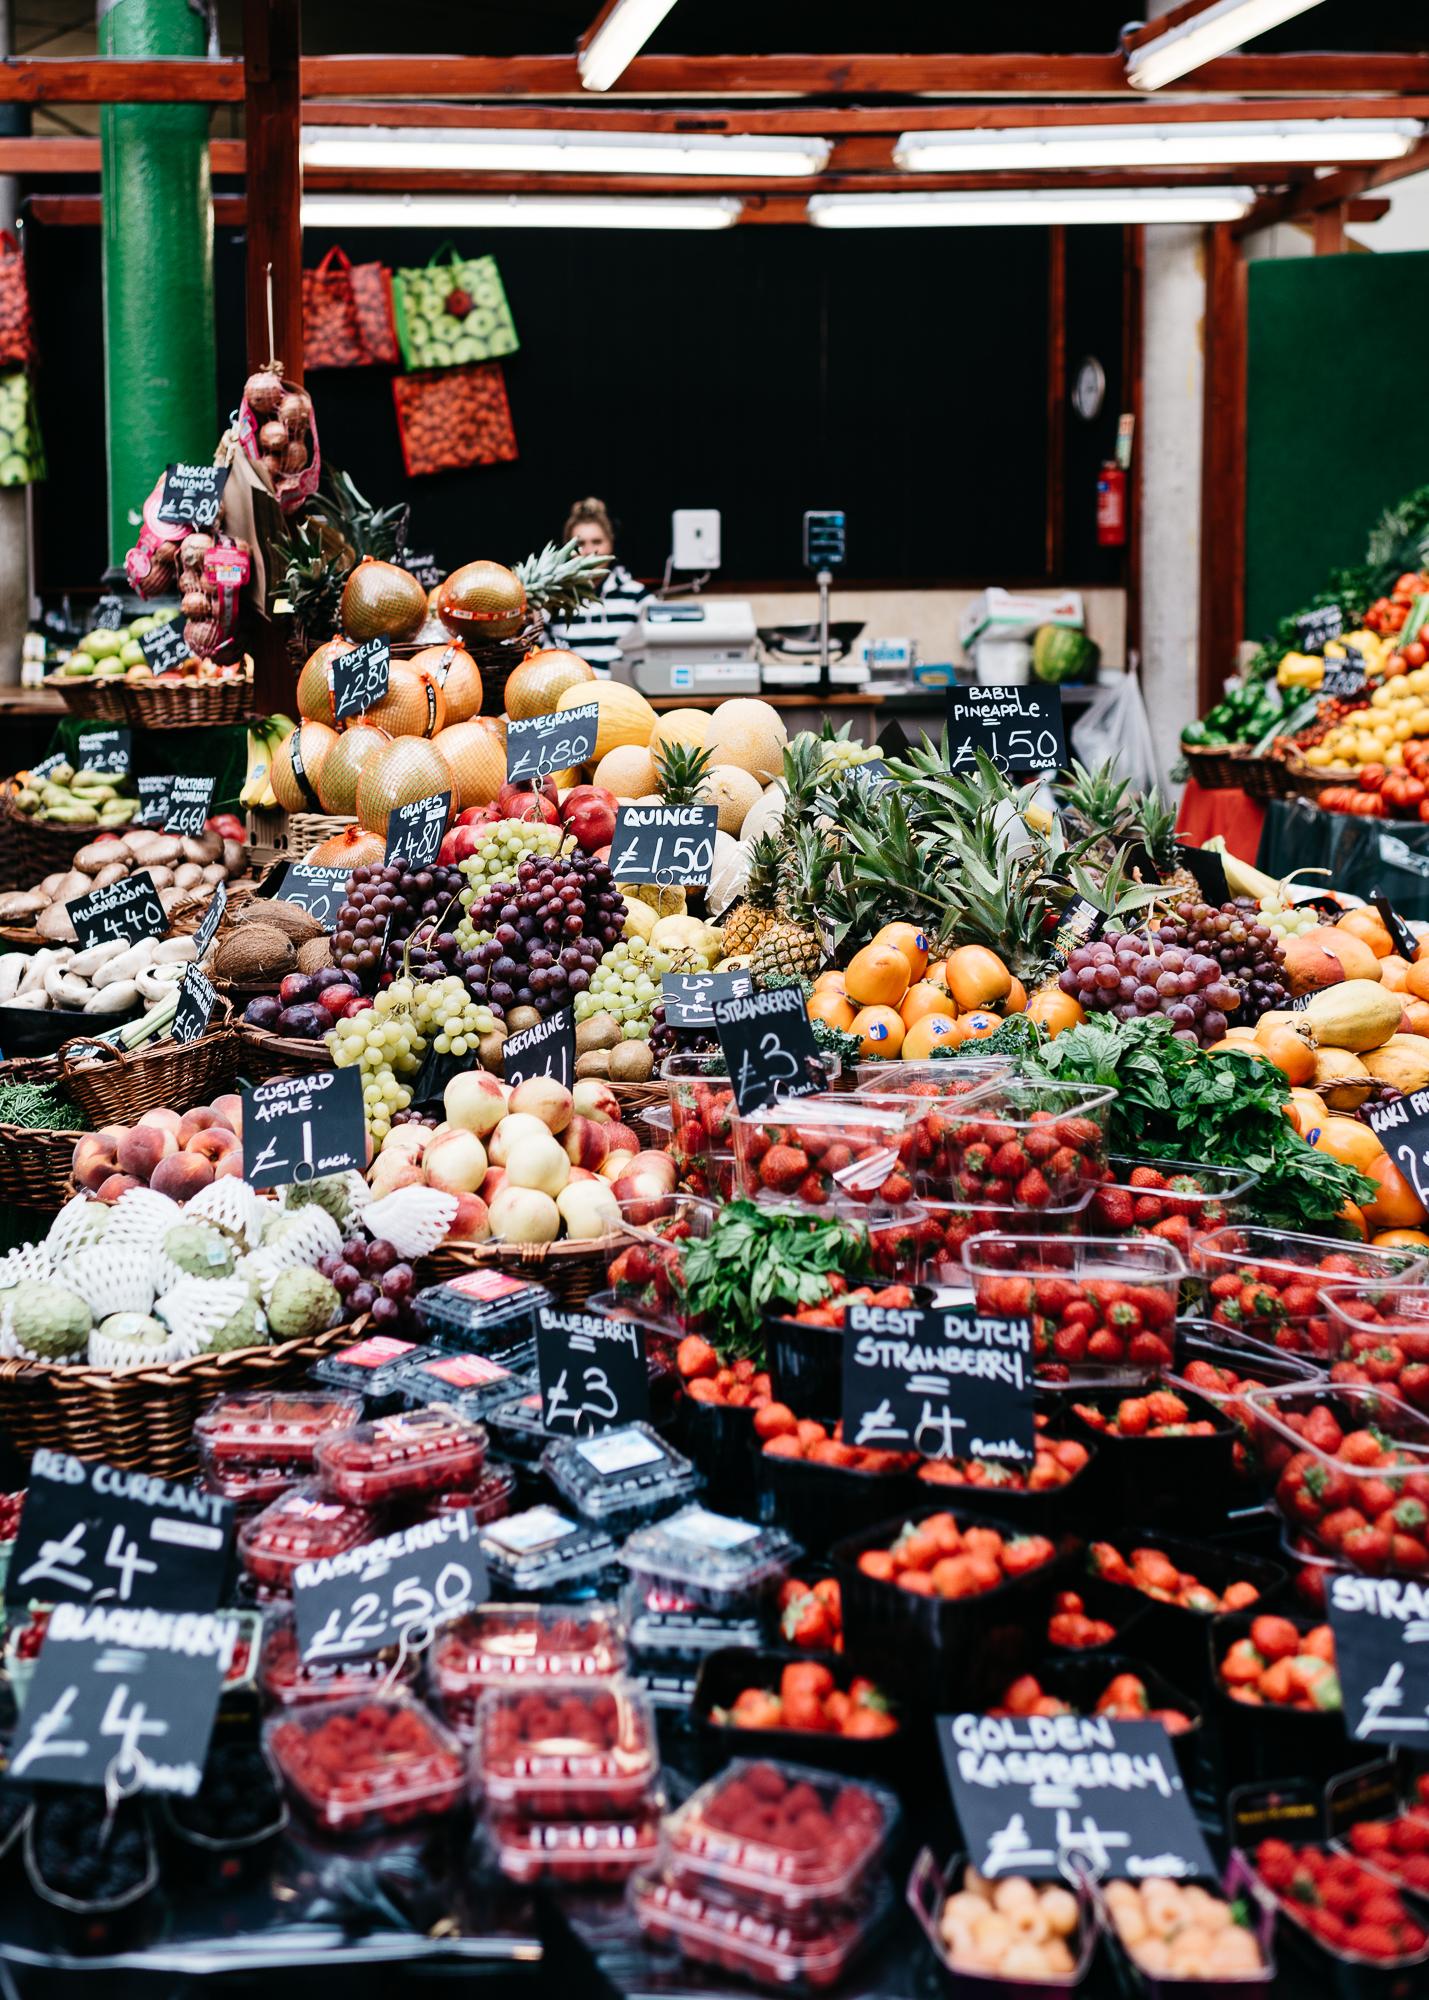 Impressive produce display at Borough Market